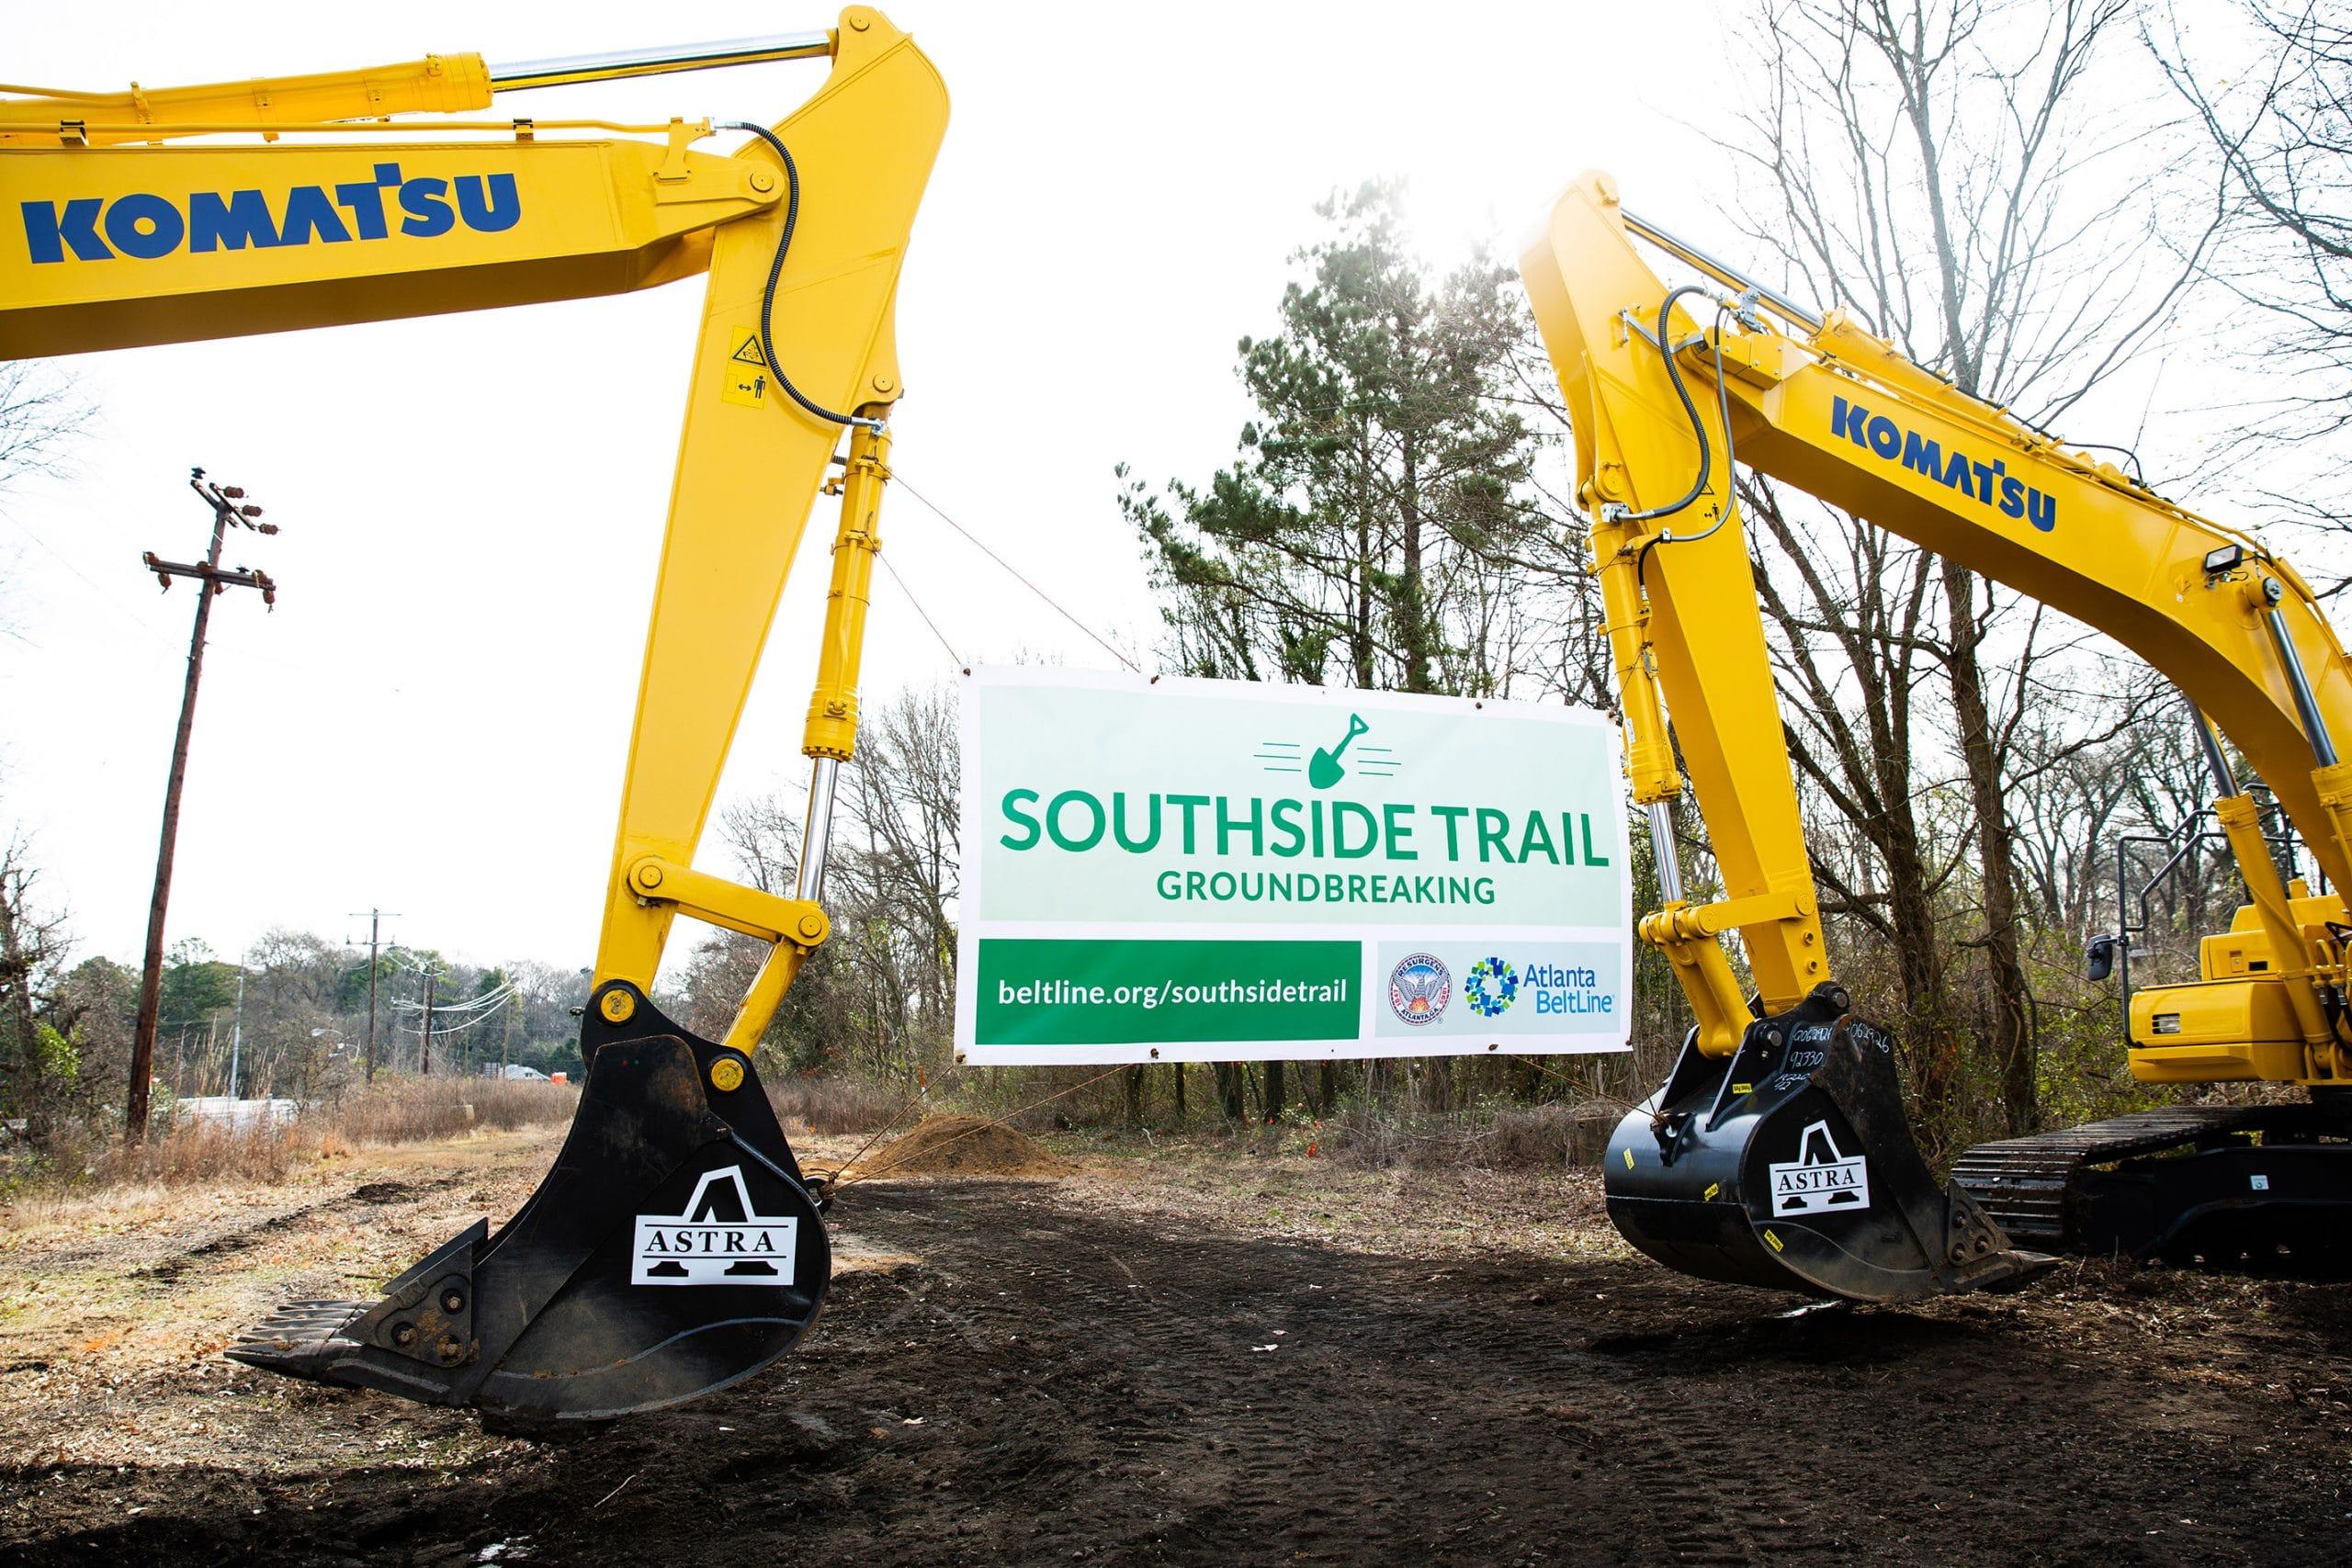 Atlanta BeltLine Southside Trail West Groundbreaking